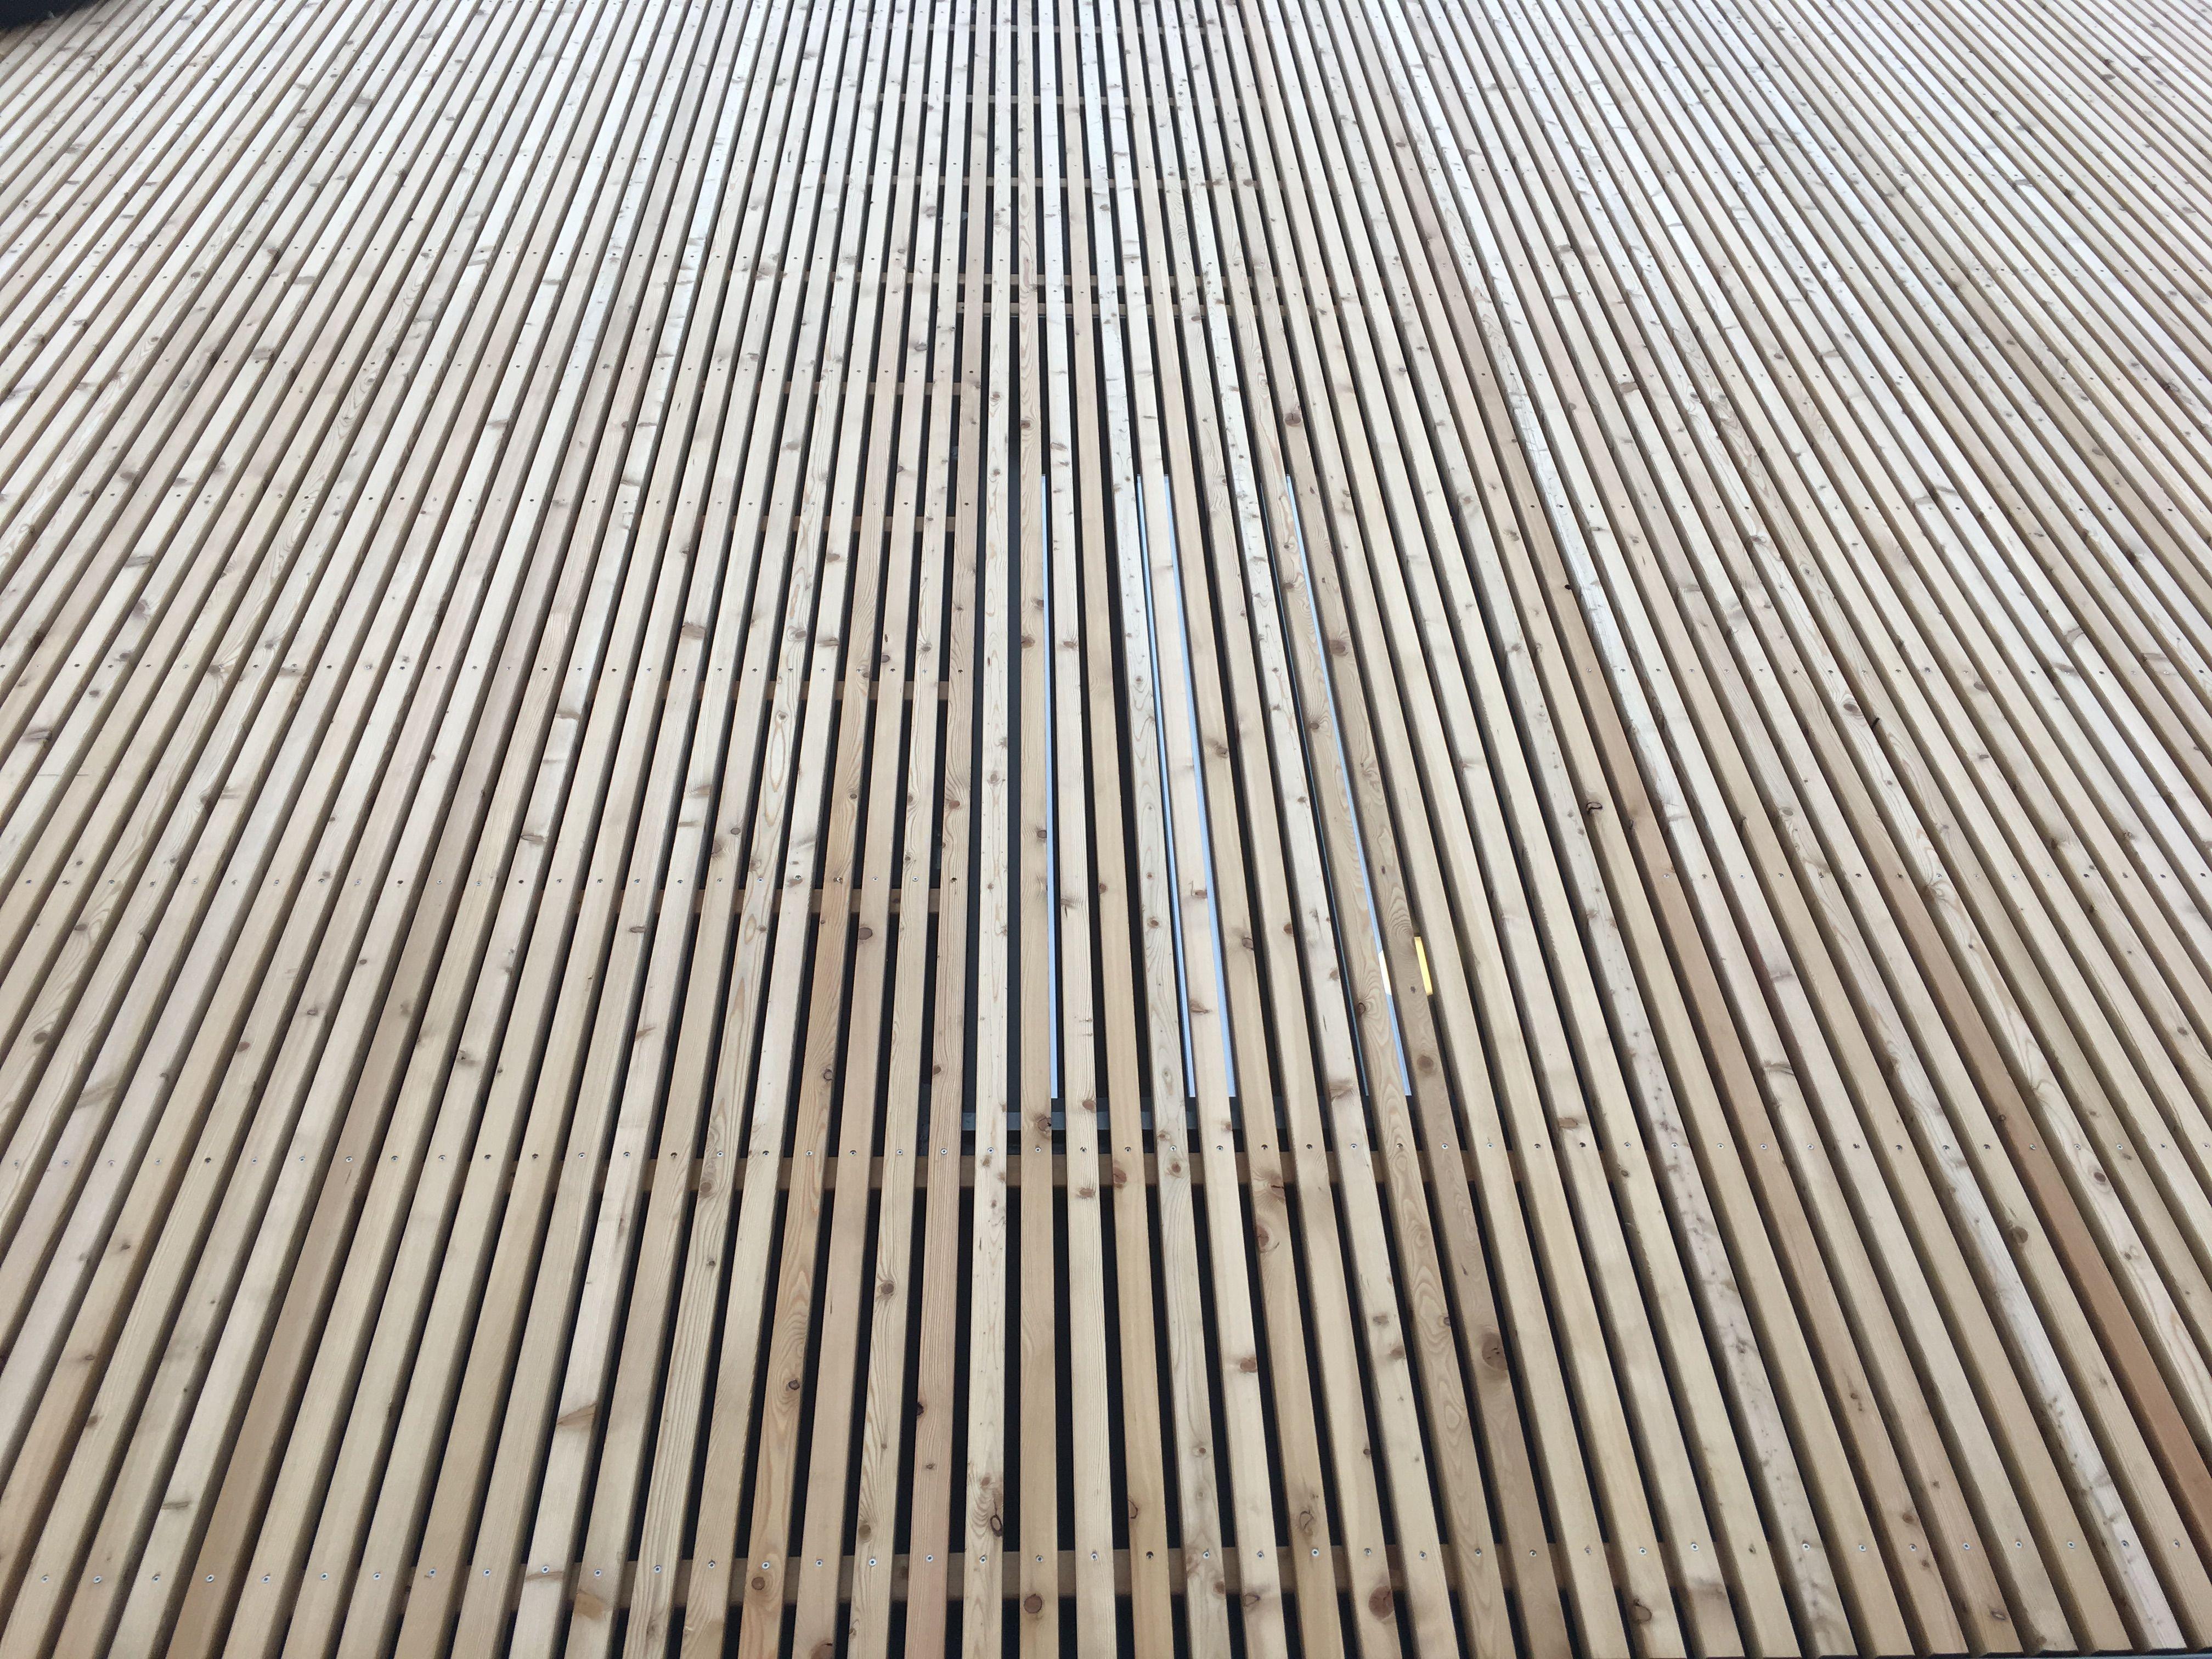 europ ische l rche fassade holzfassade wood cladding pinterest wood cladding and cladding. Black Bedroom Furniture Sets. Home Design Ideas